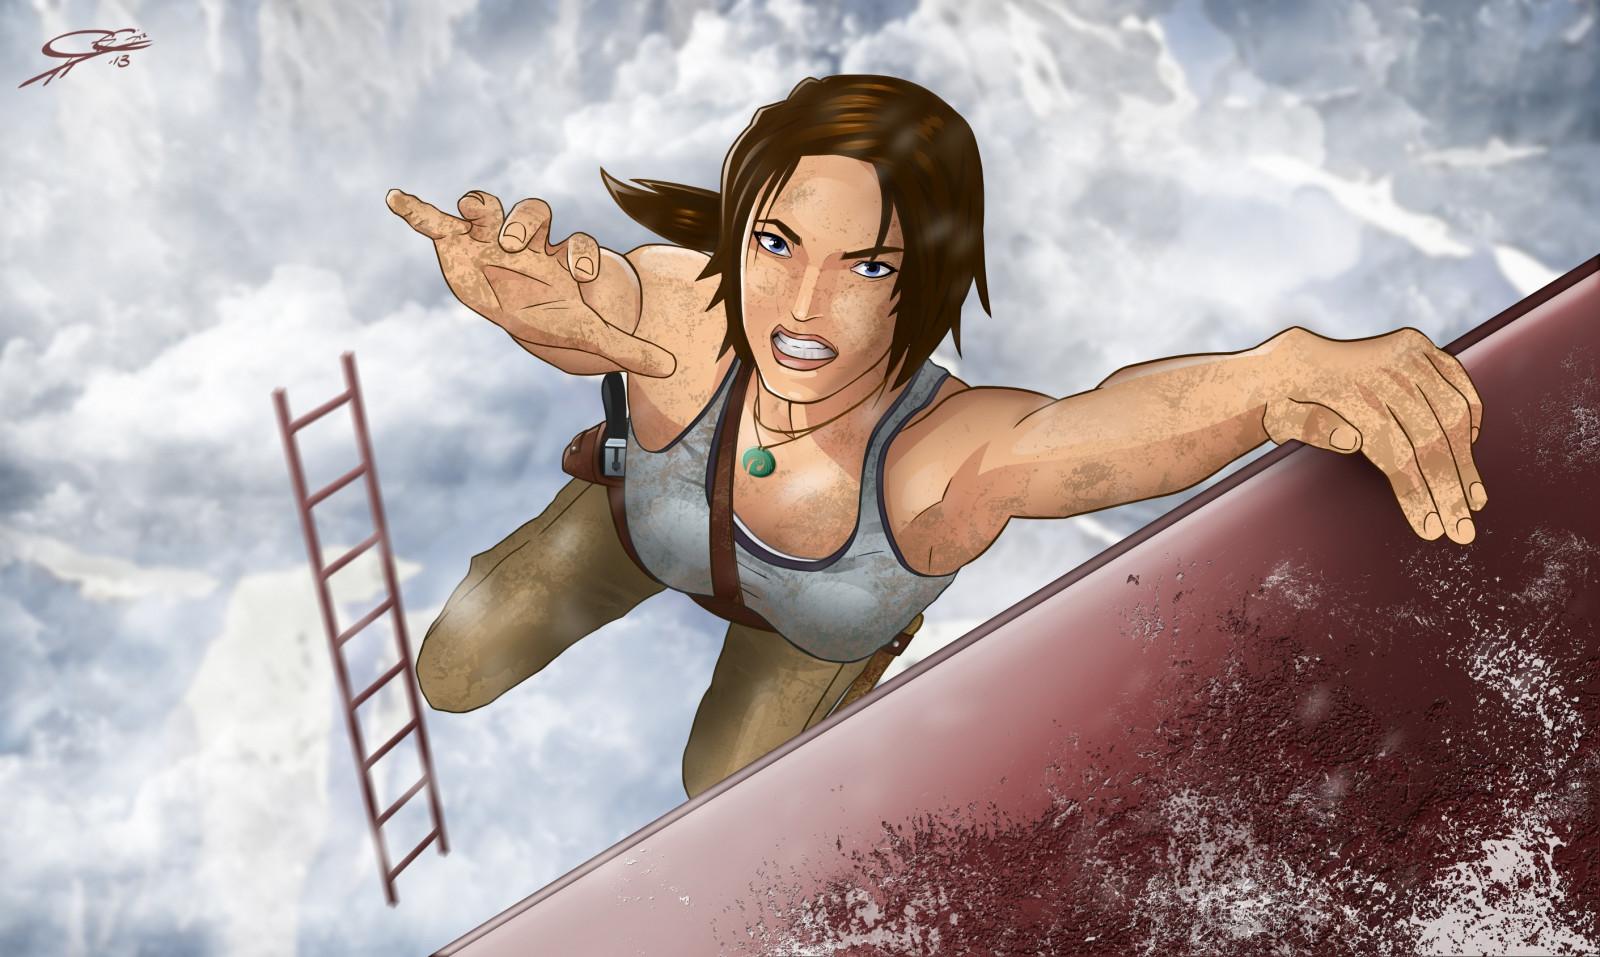 Lara croft hair erotic reality breasts